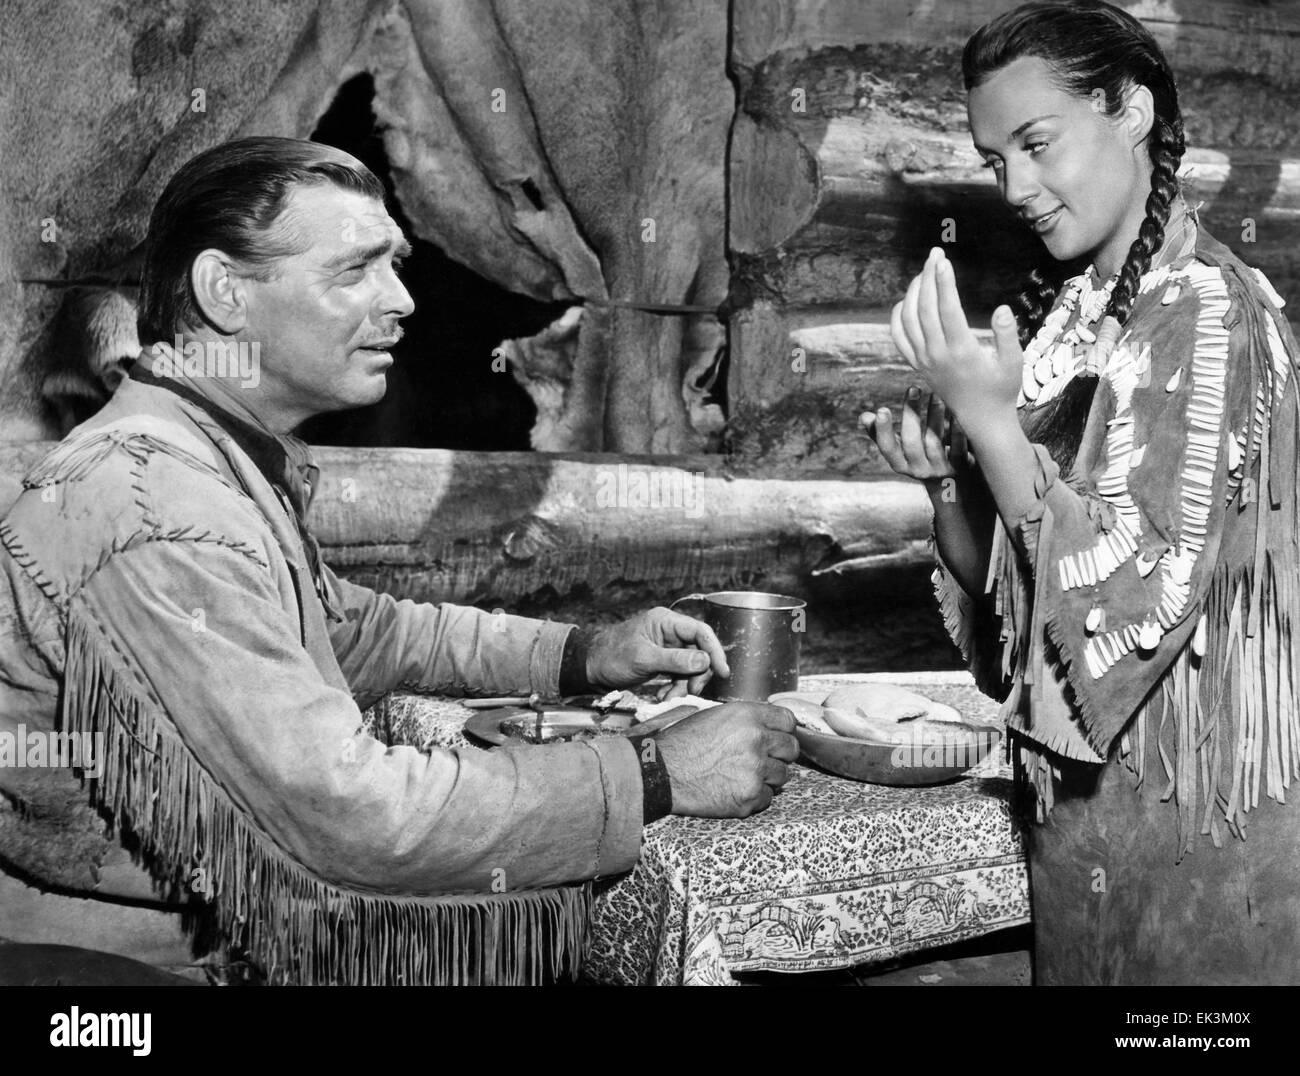 Clark Gable, Maria Elena Marques, on-set of the Film 'Across the Wide Missouri', 1951 - Stock Image